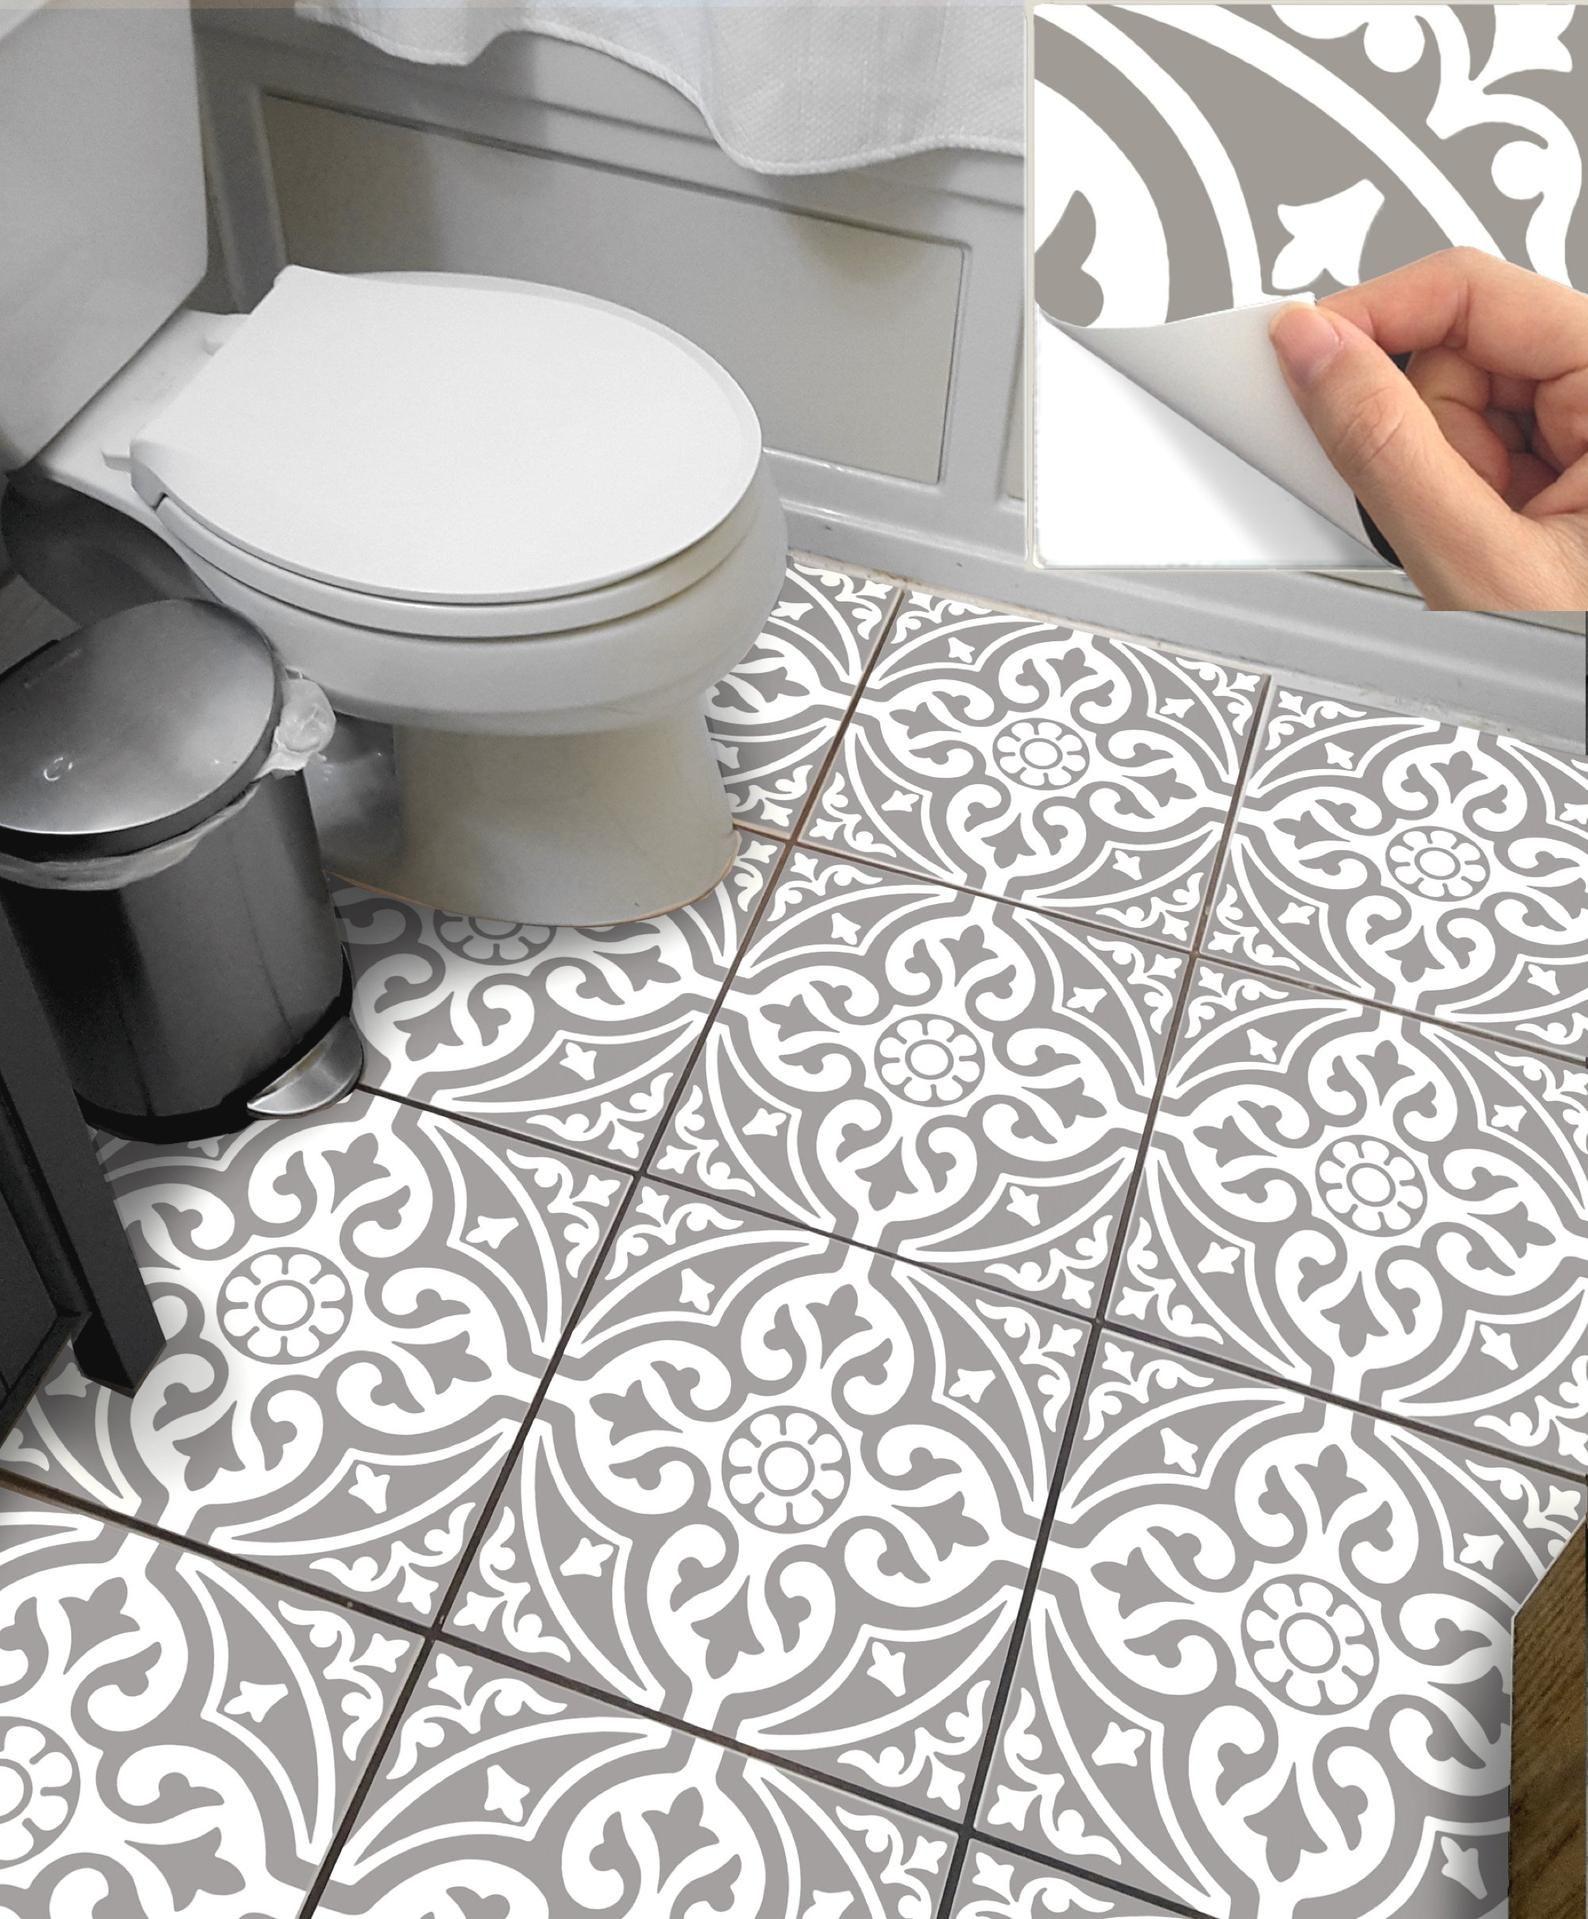 Tile Sticker For Kitchen Bath Floor Wall Waterproof Etsy Wall Waterproofing Flooring Kitchen And Bath